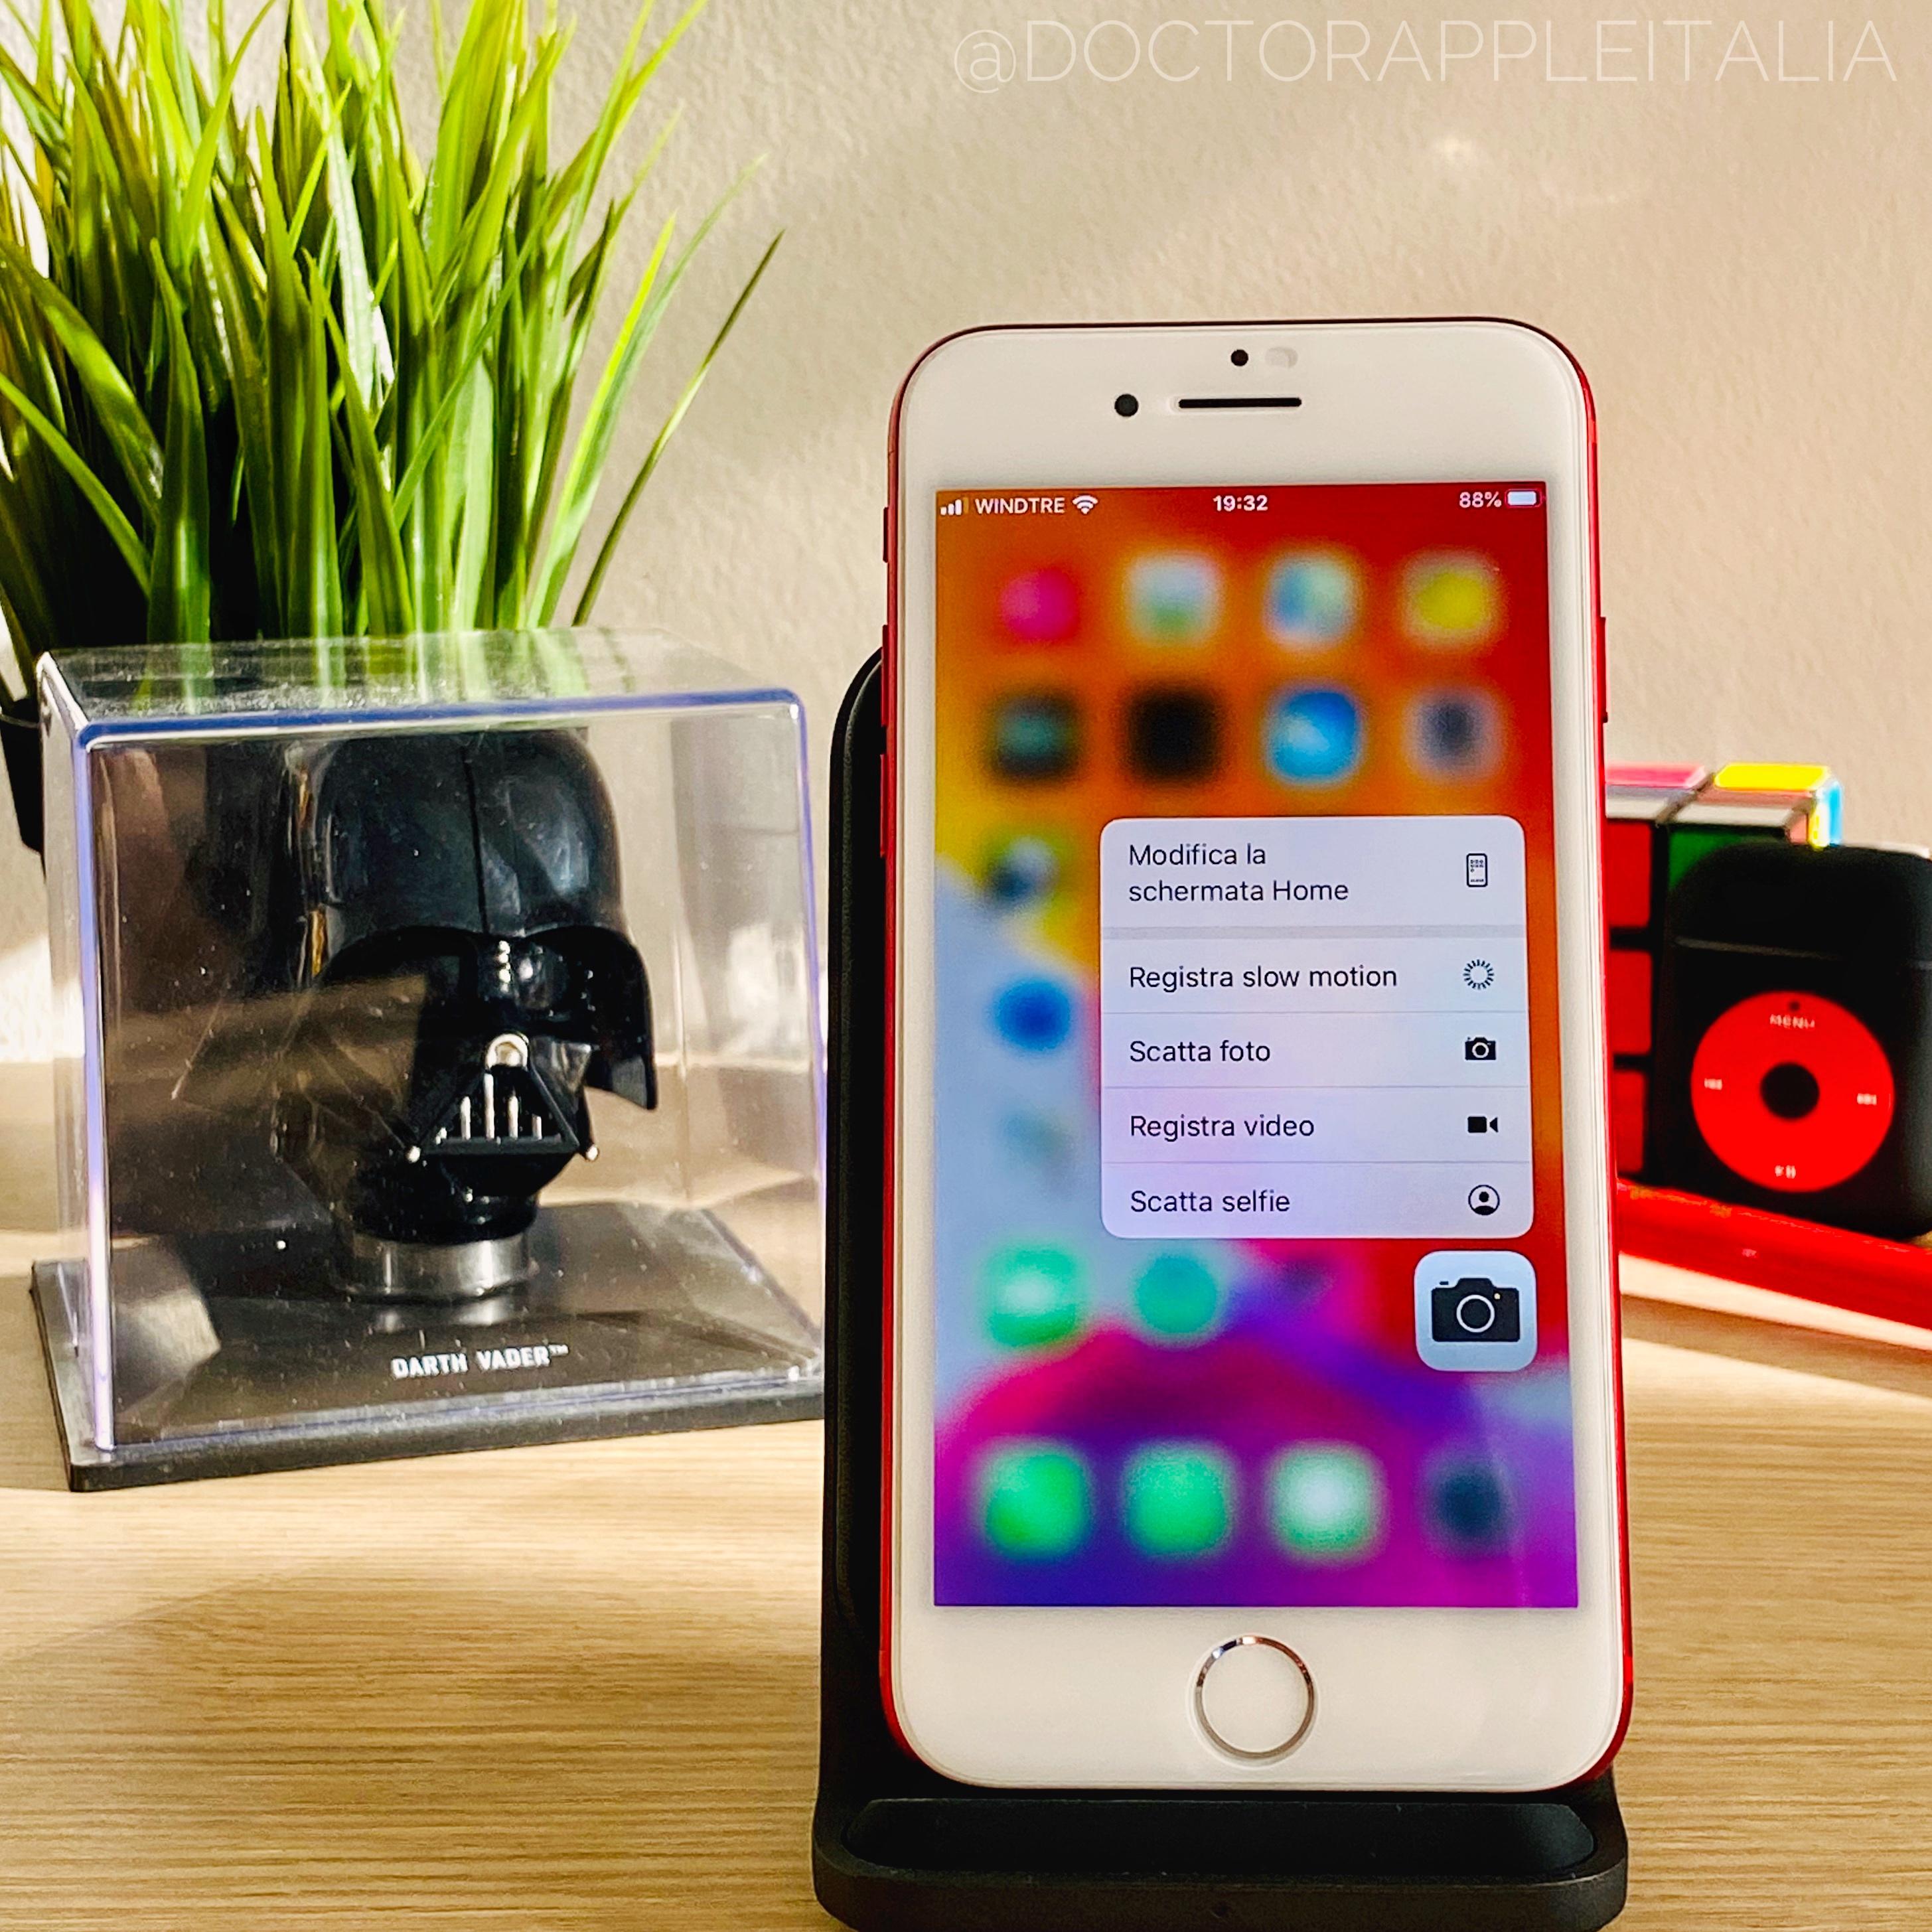 iphone7-8_cavo_ceotech_doctorapple_6